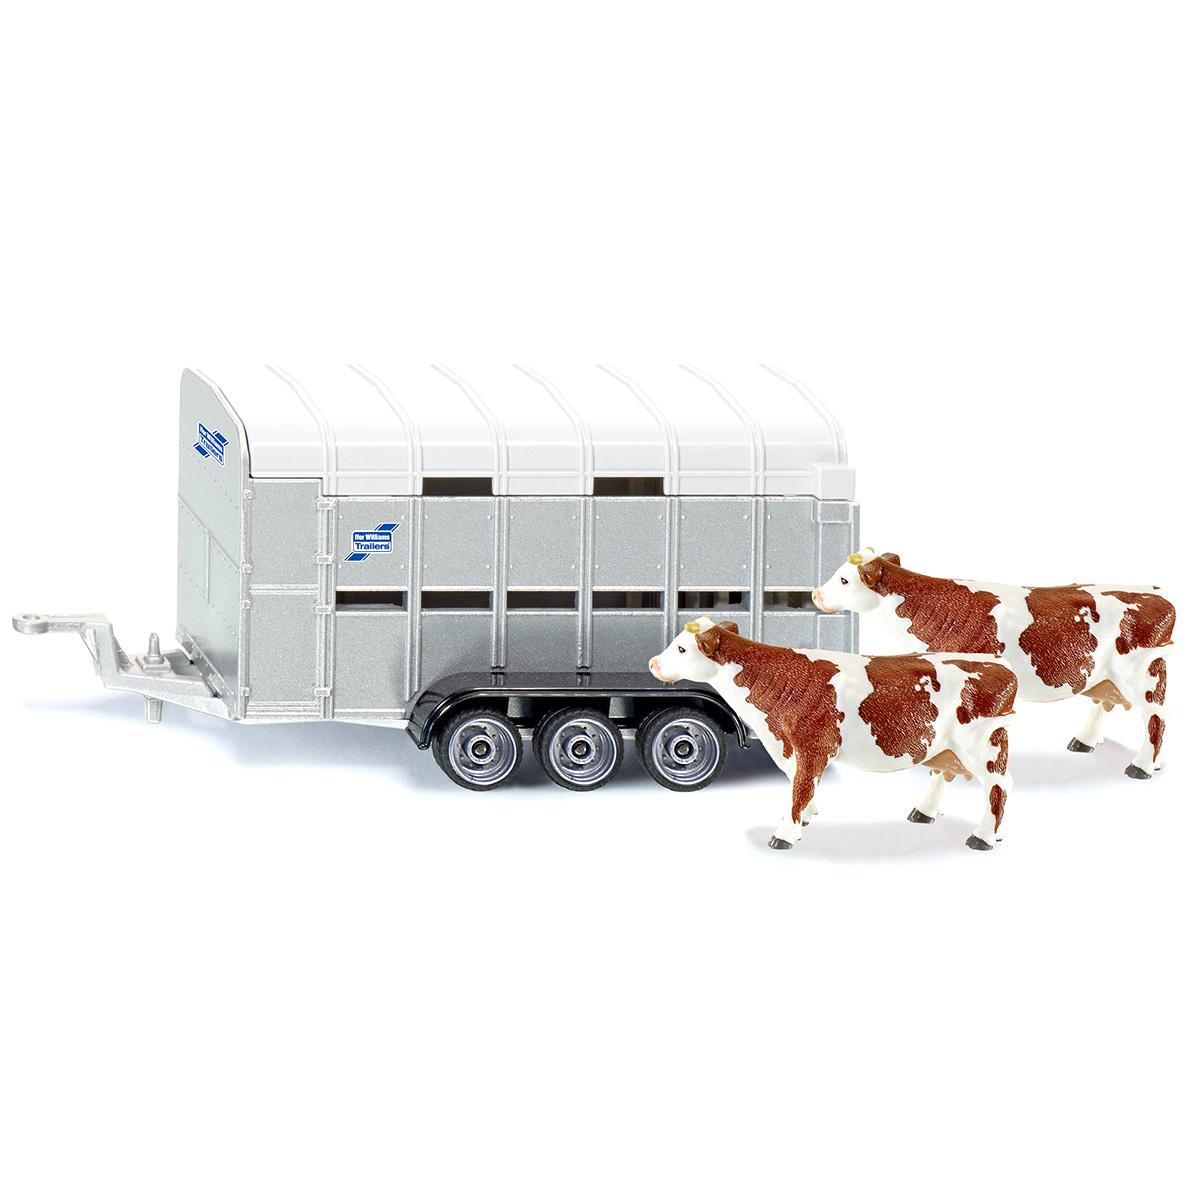 ファーマー 大型家畜運搬車 1:32(ジク・SIKU)